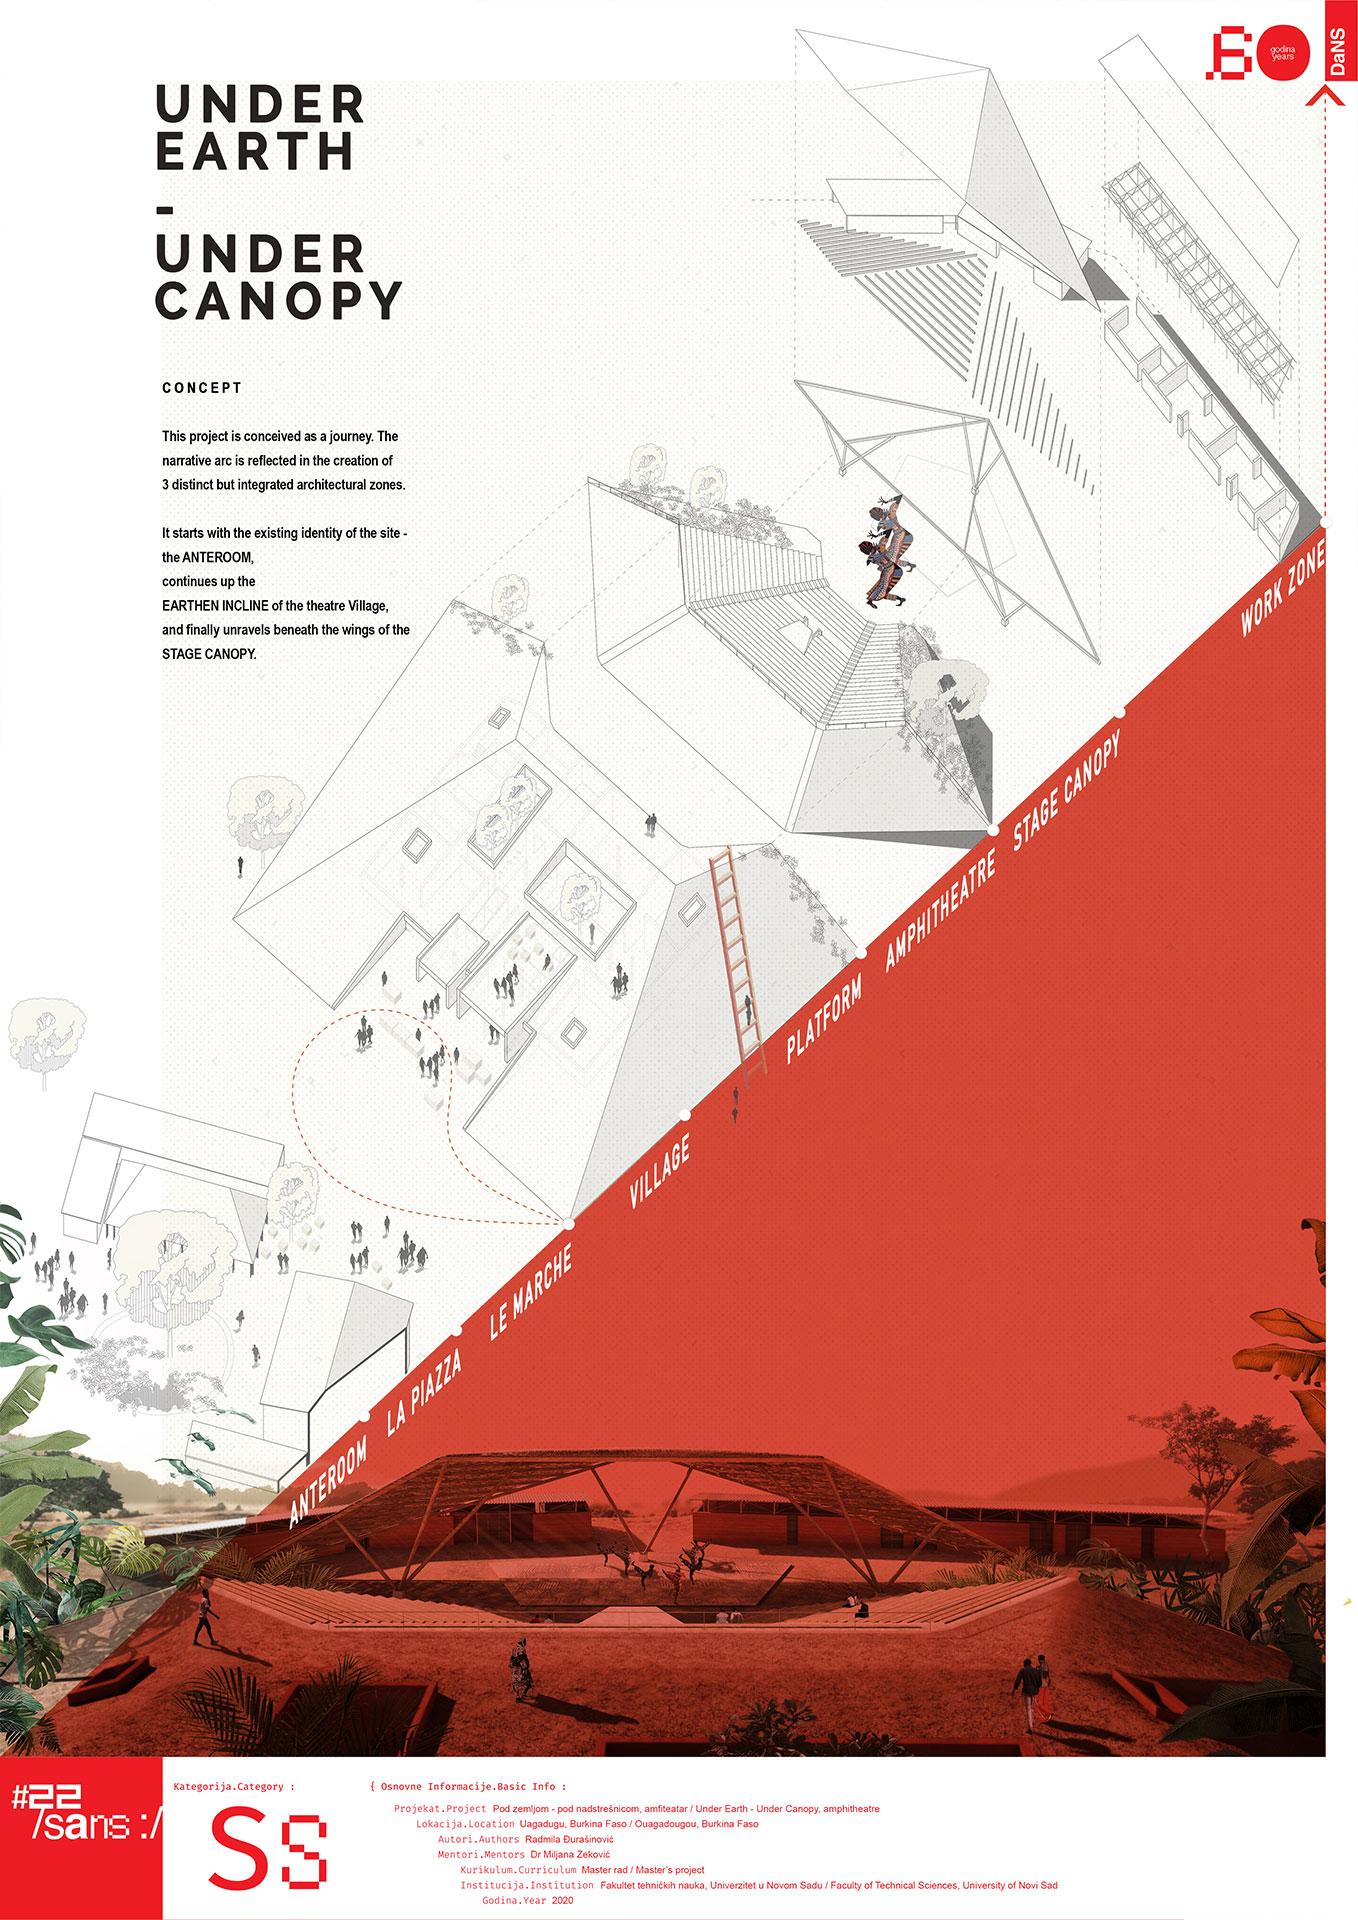 Ispod zemlje - ispod nadstrešnice // Under the Earth - Under the Canopy